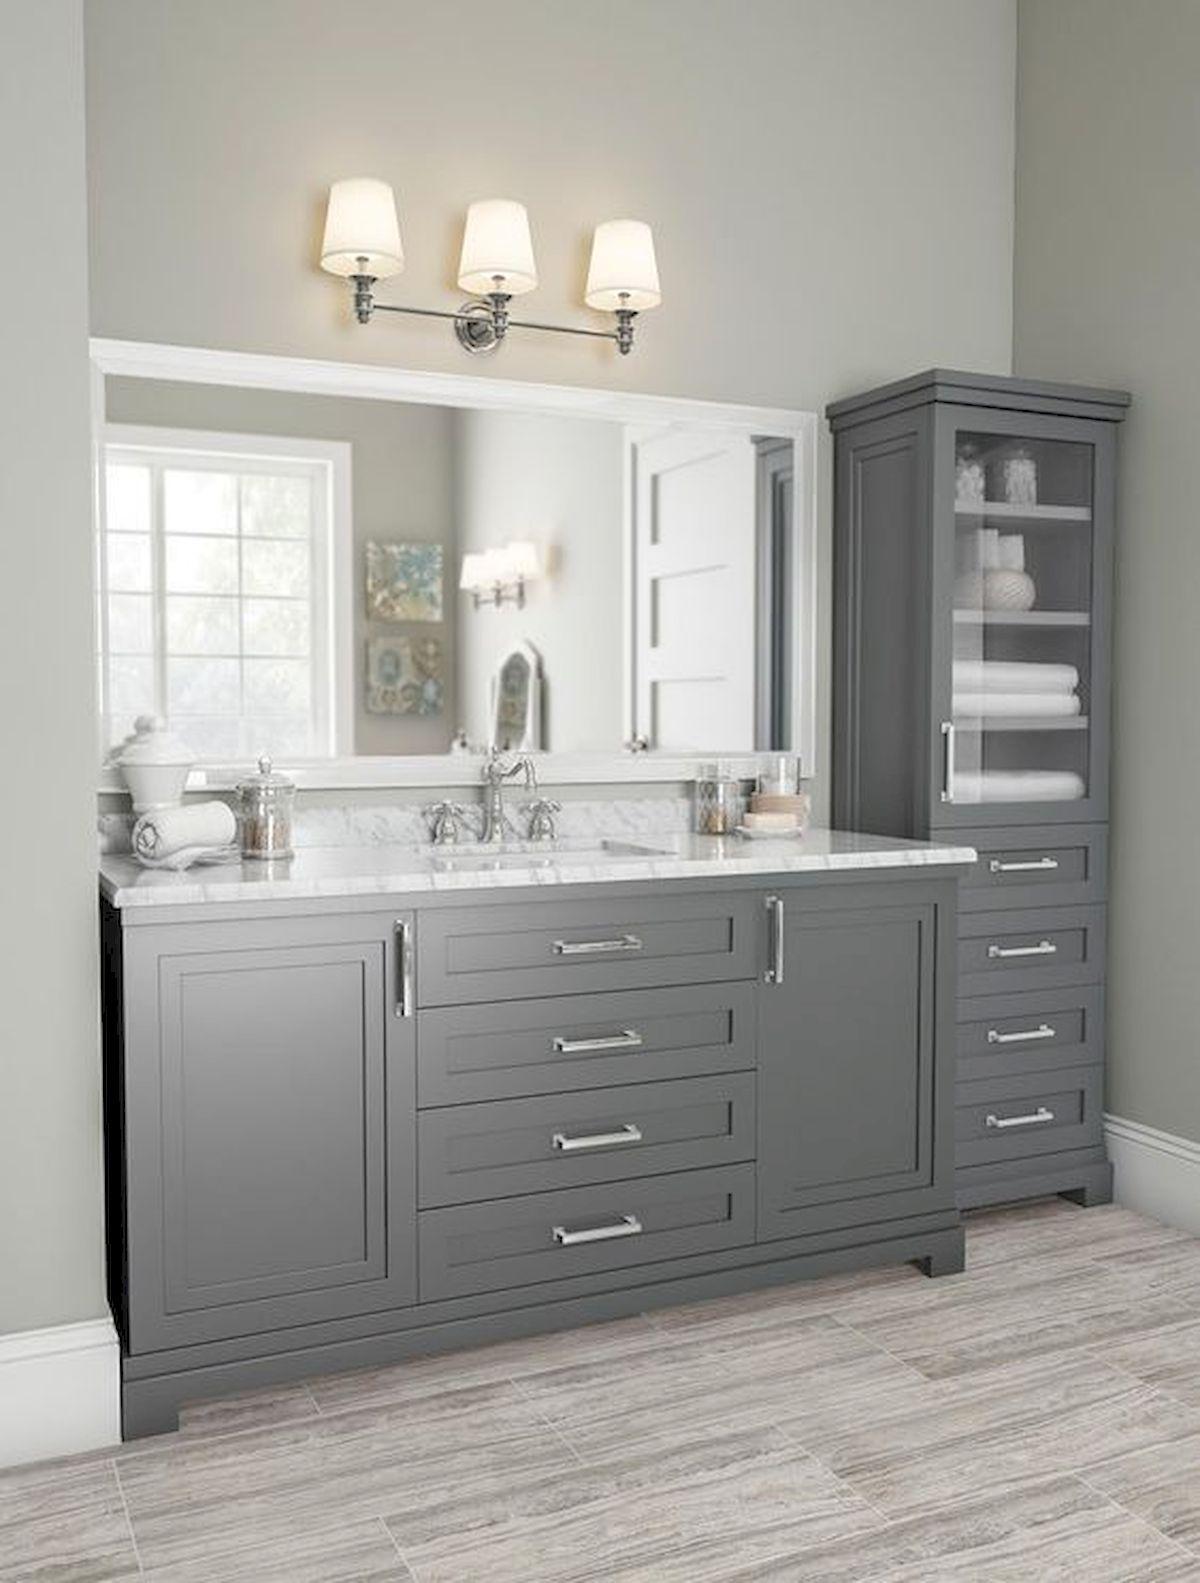 60 Fantastic Farmhouse Bathroom Vanity Decor Ideas And Remodel - Googodecor